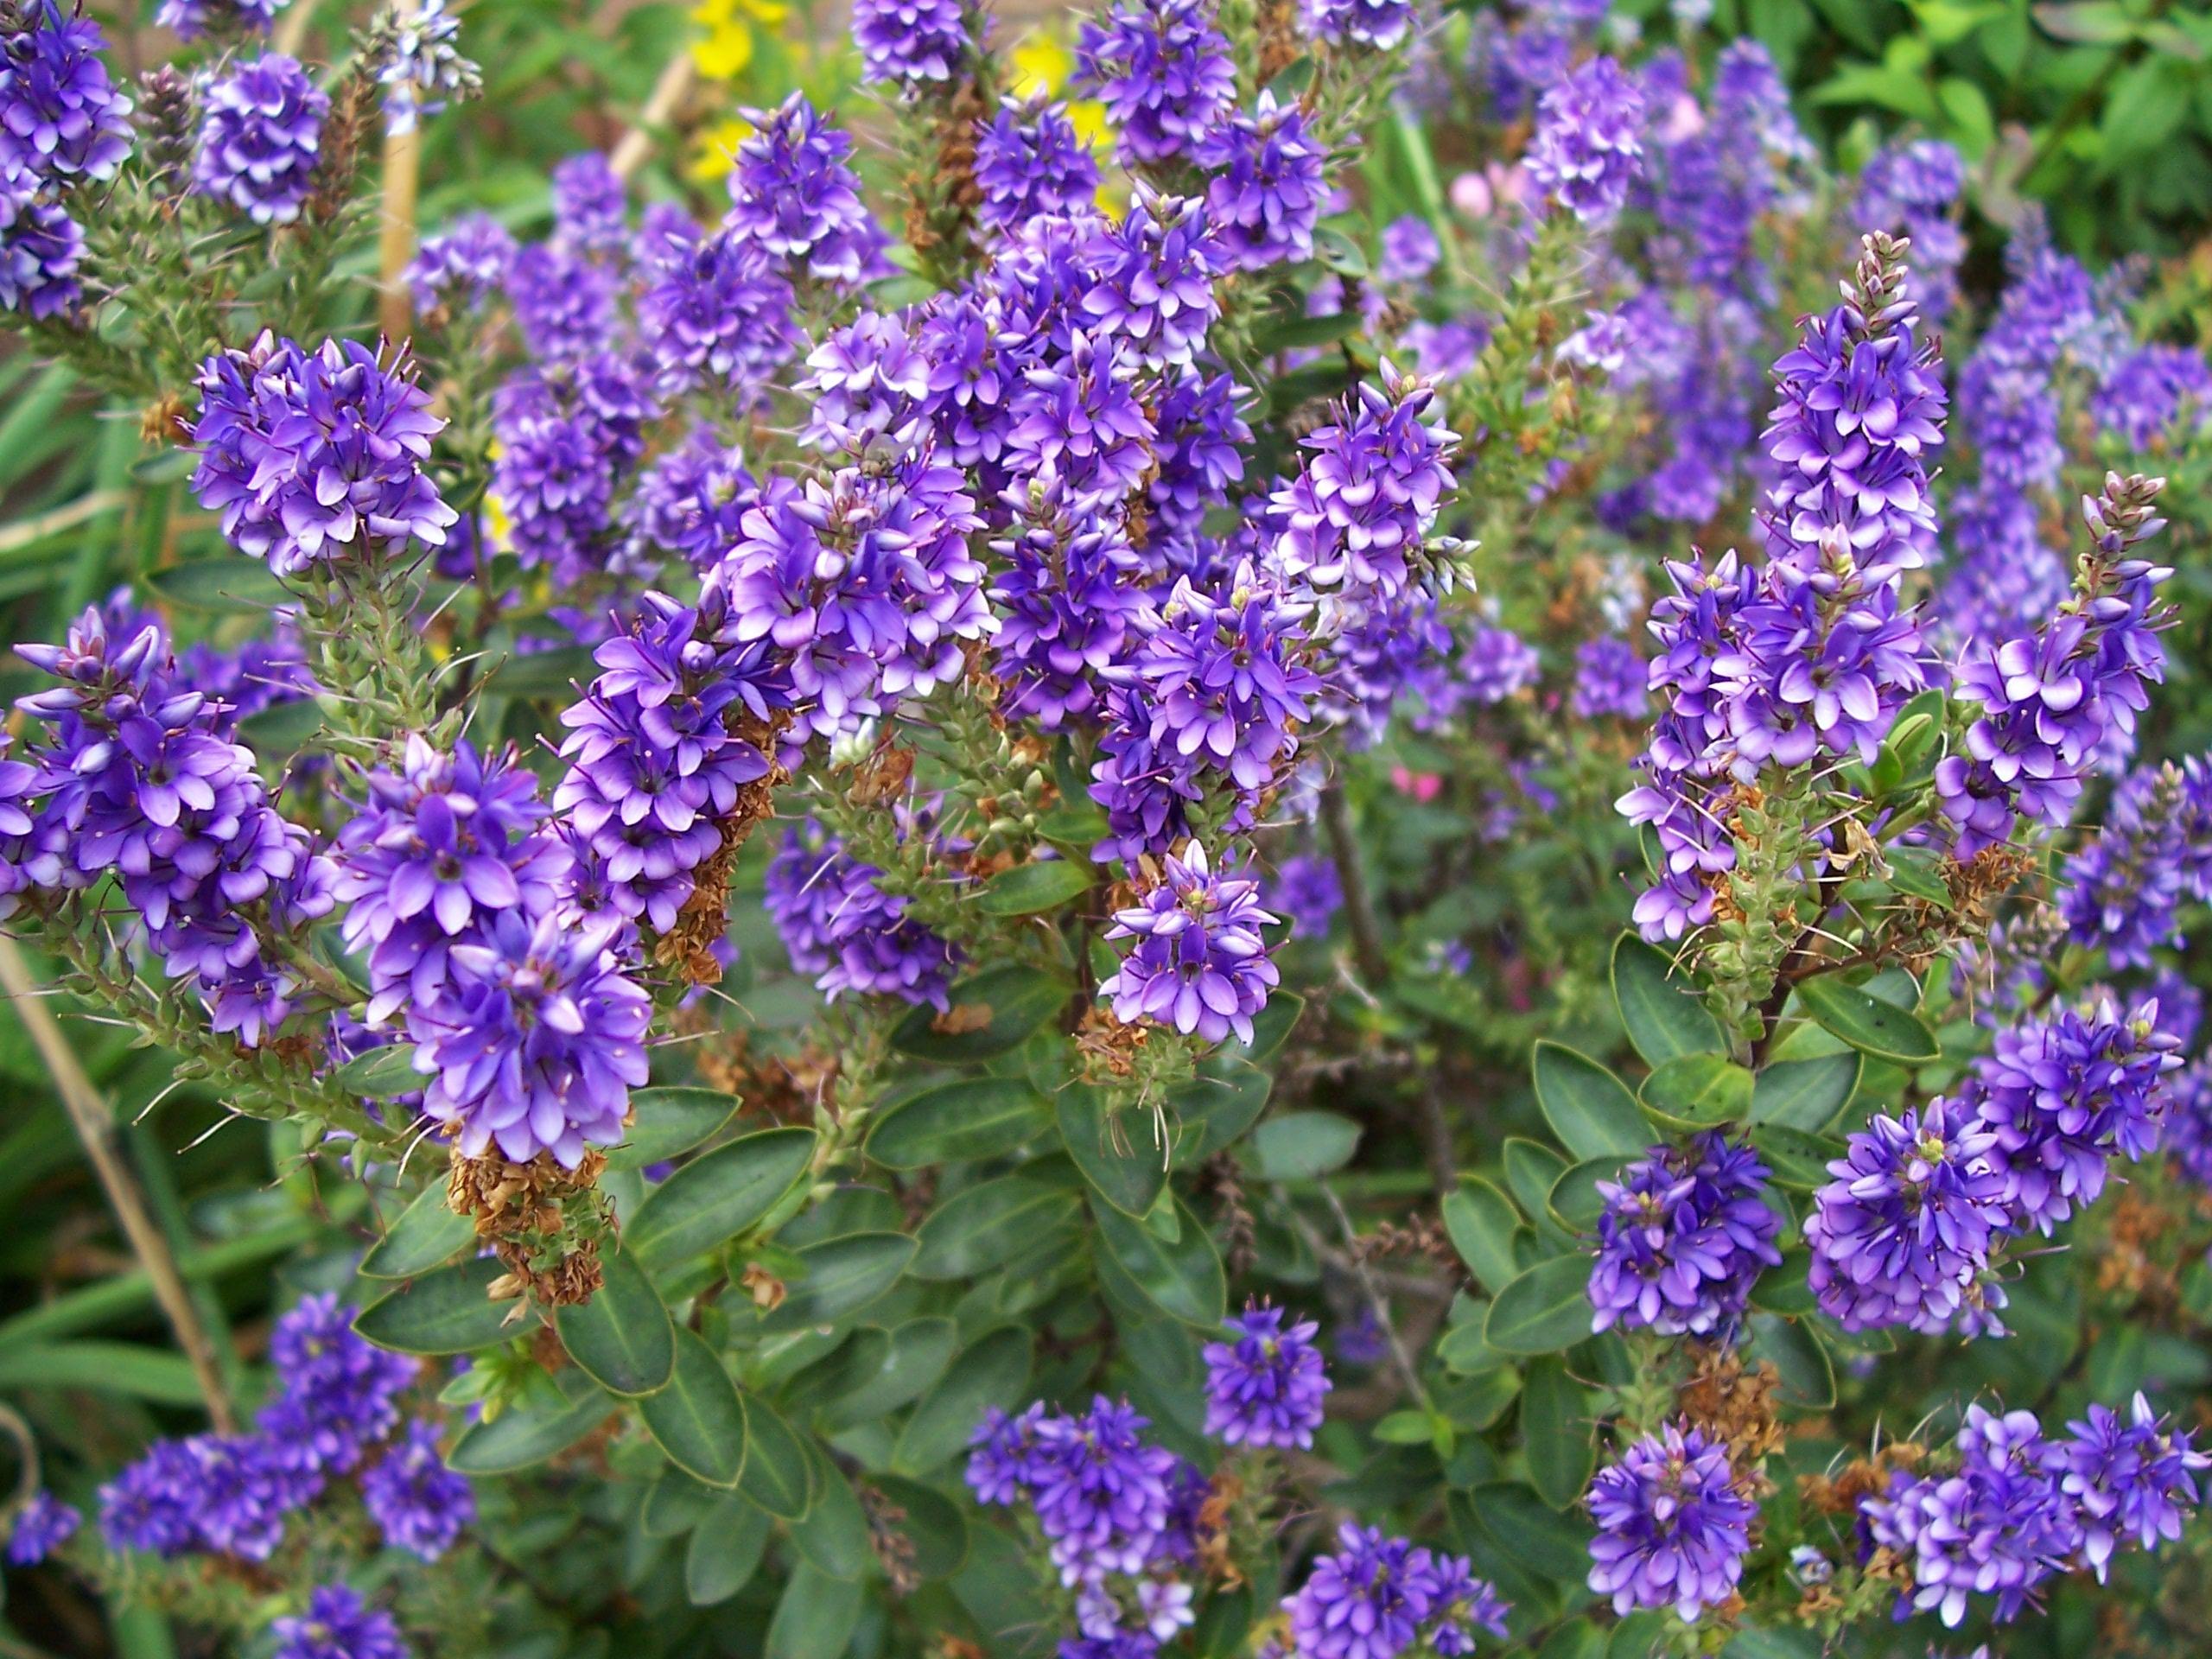 Free Images Meadow Flower Bush Herb Flora Perennial